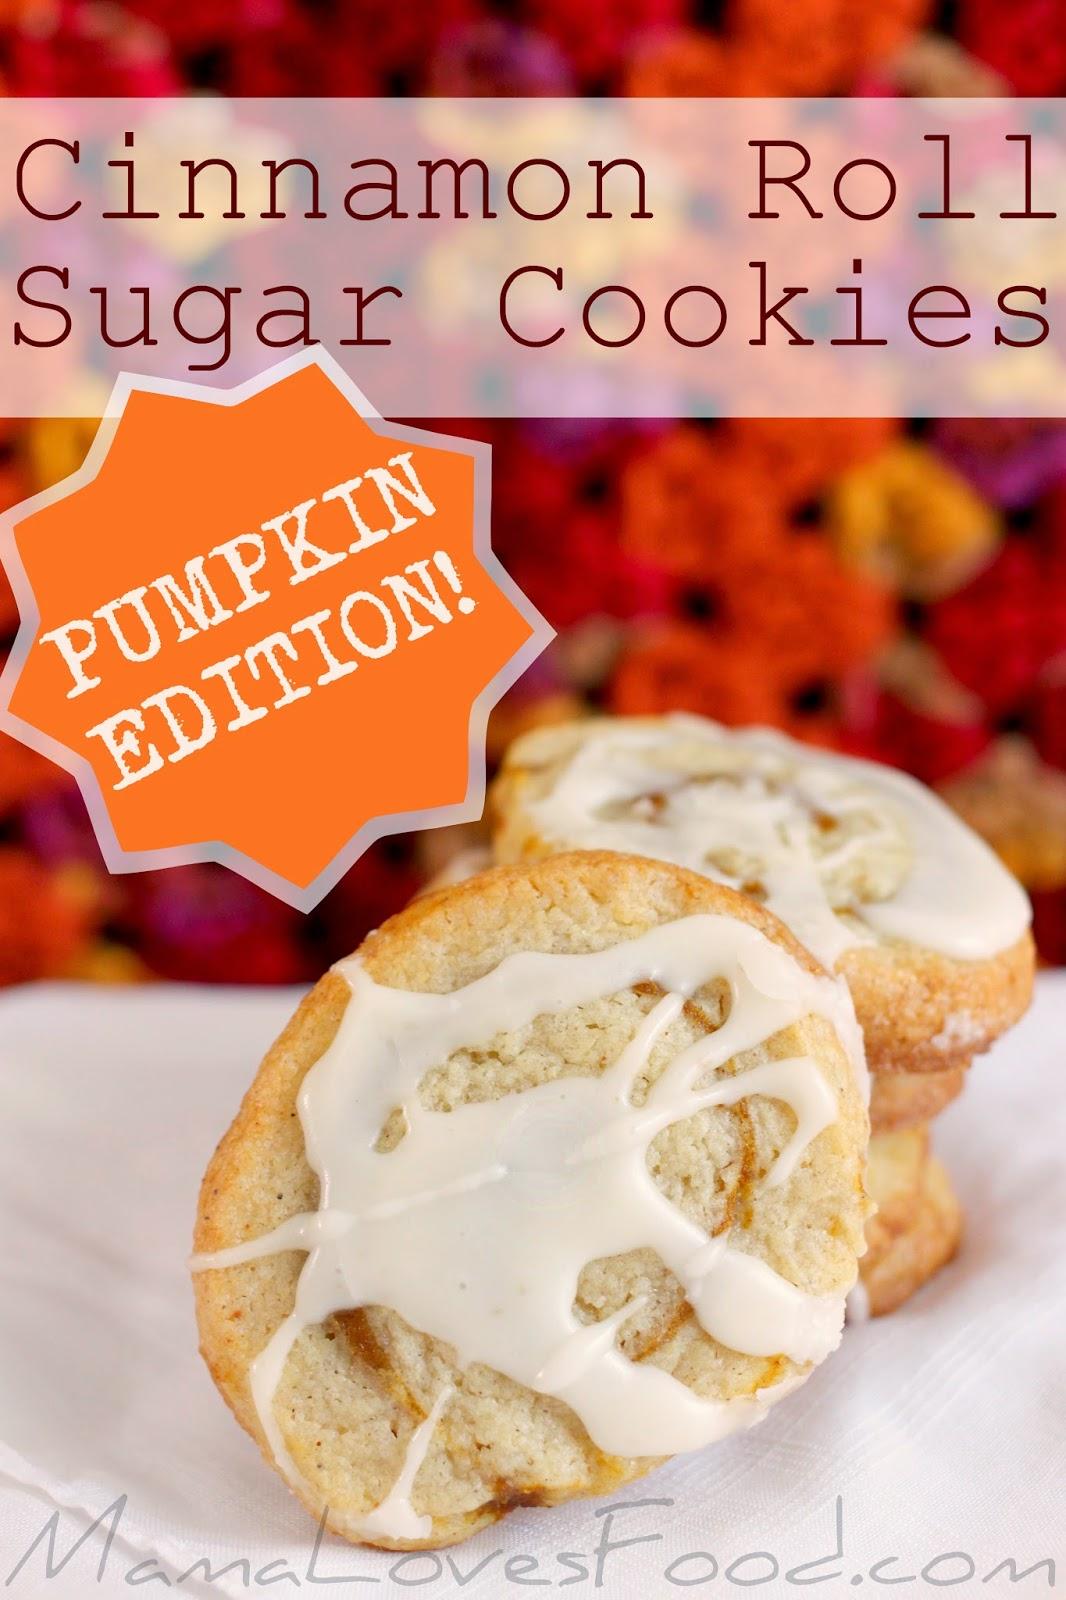 Mama Loves Food!: Cinnamon Roll Sugar Cookies - Pumpkin Edition!